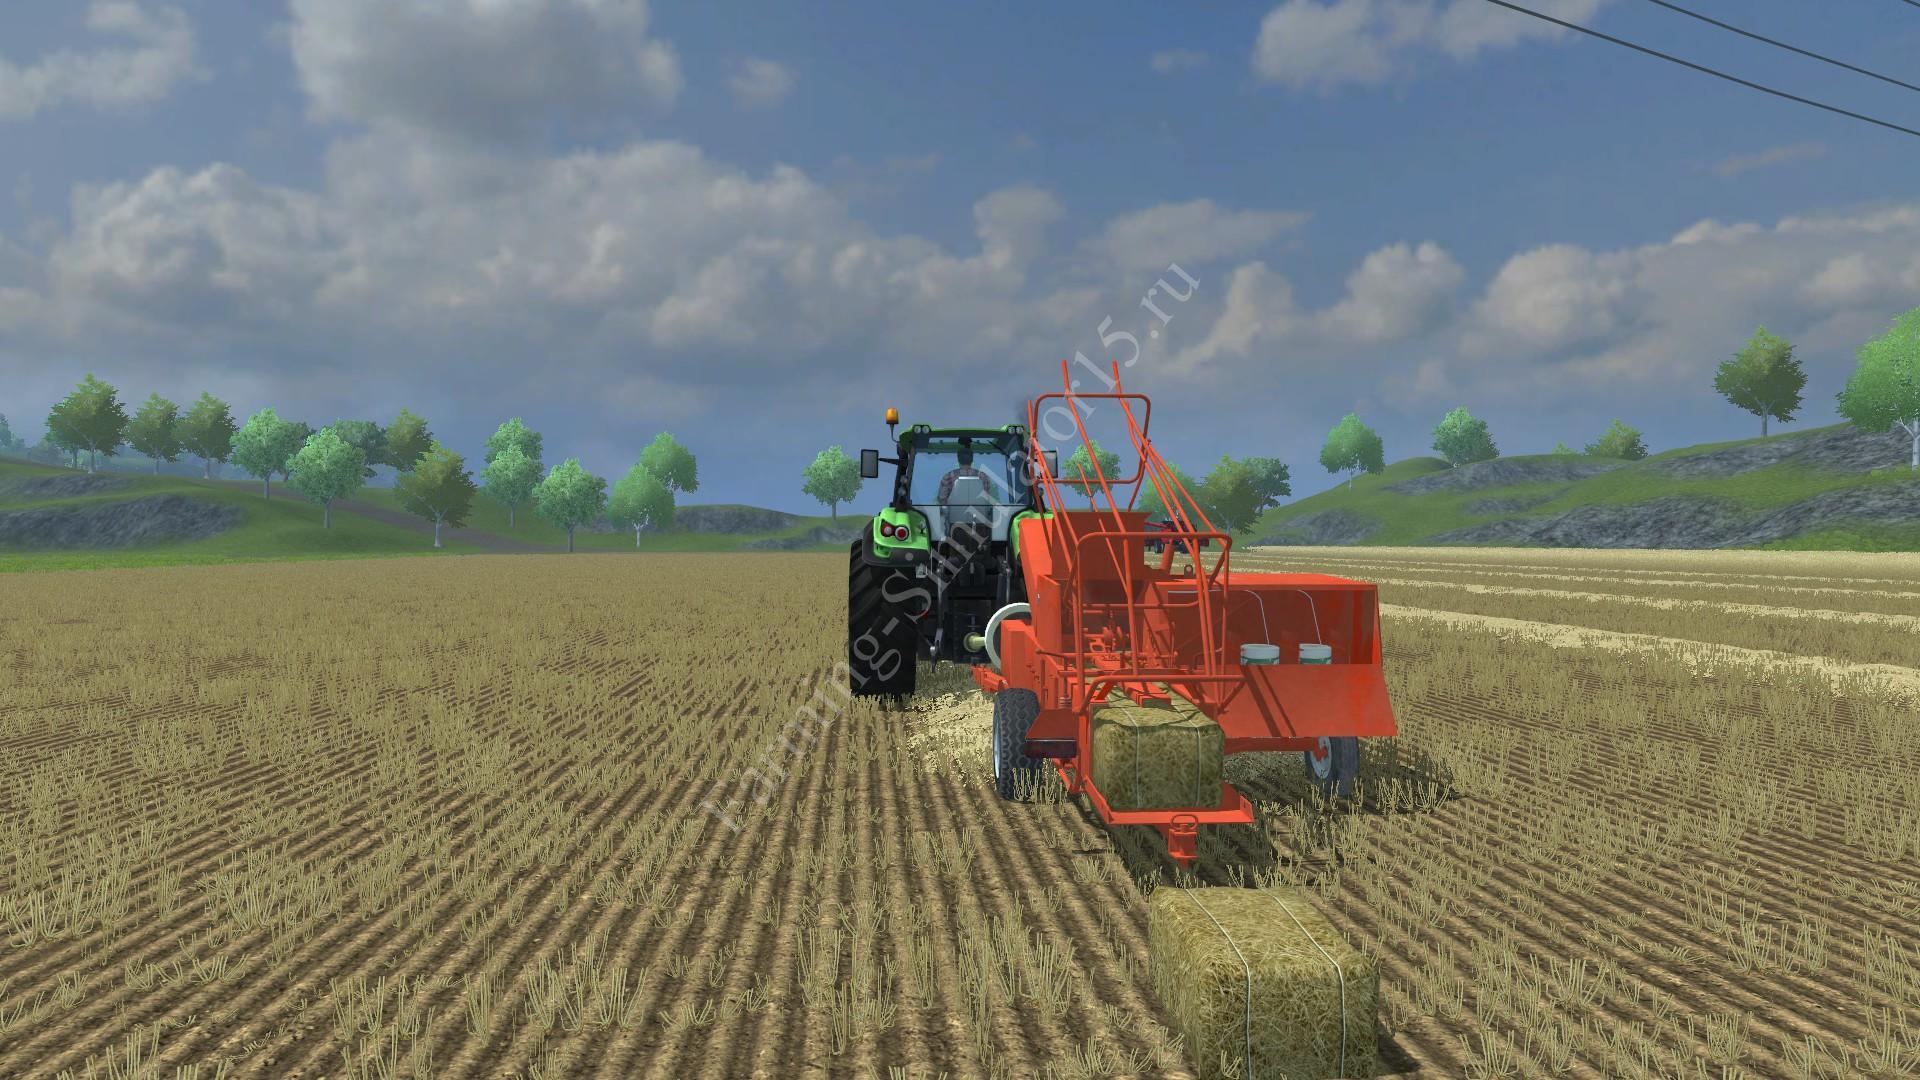 Мод тюкопресса Sipma Z224 1 v 2.1 Washable Farming Simulator 2013, Farming Simulator 13